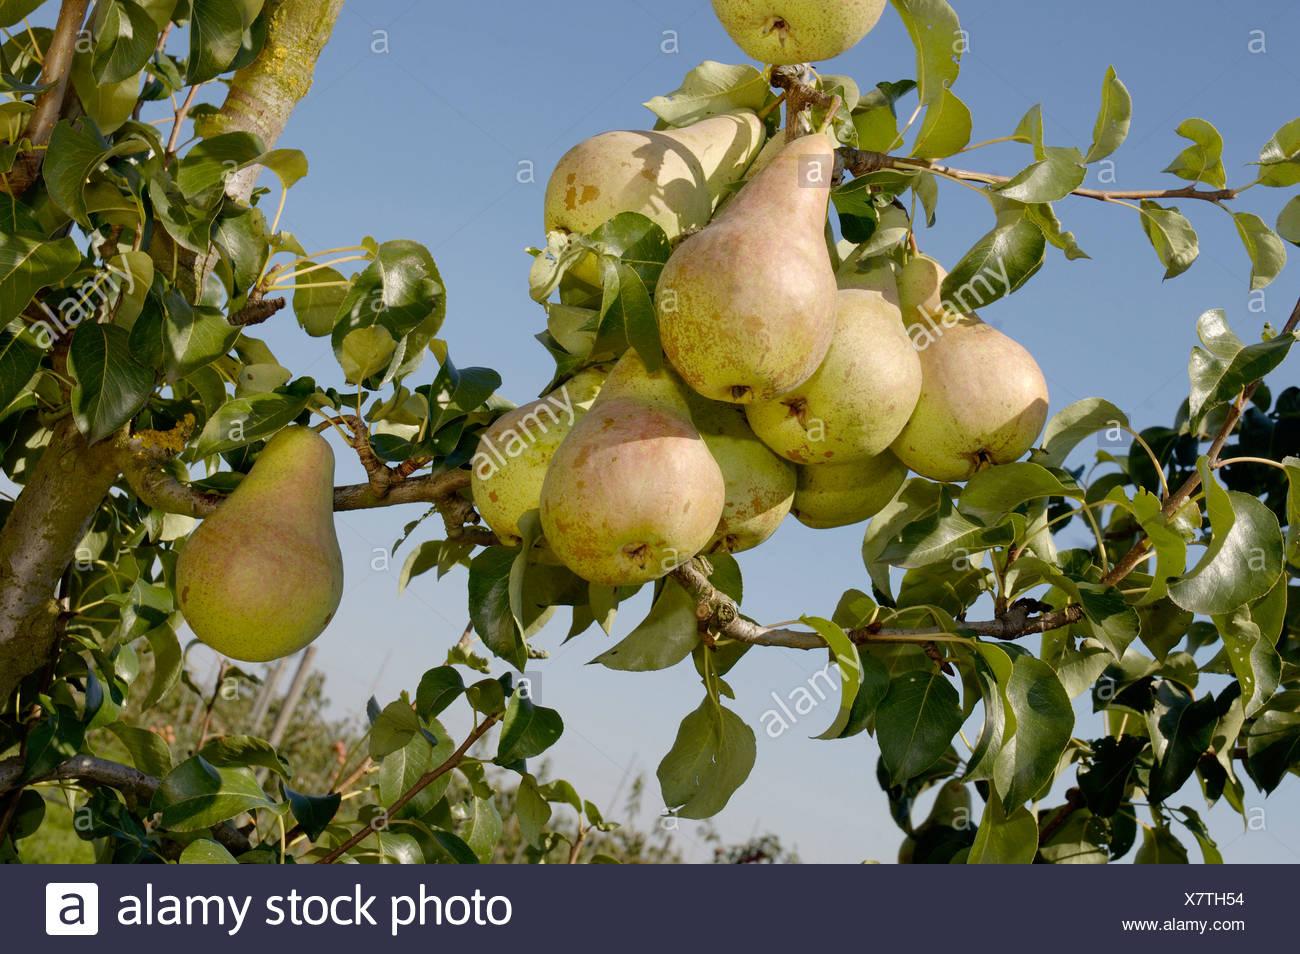 Pear / Concord - Stock Image